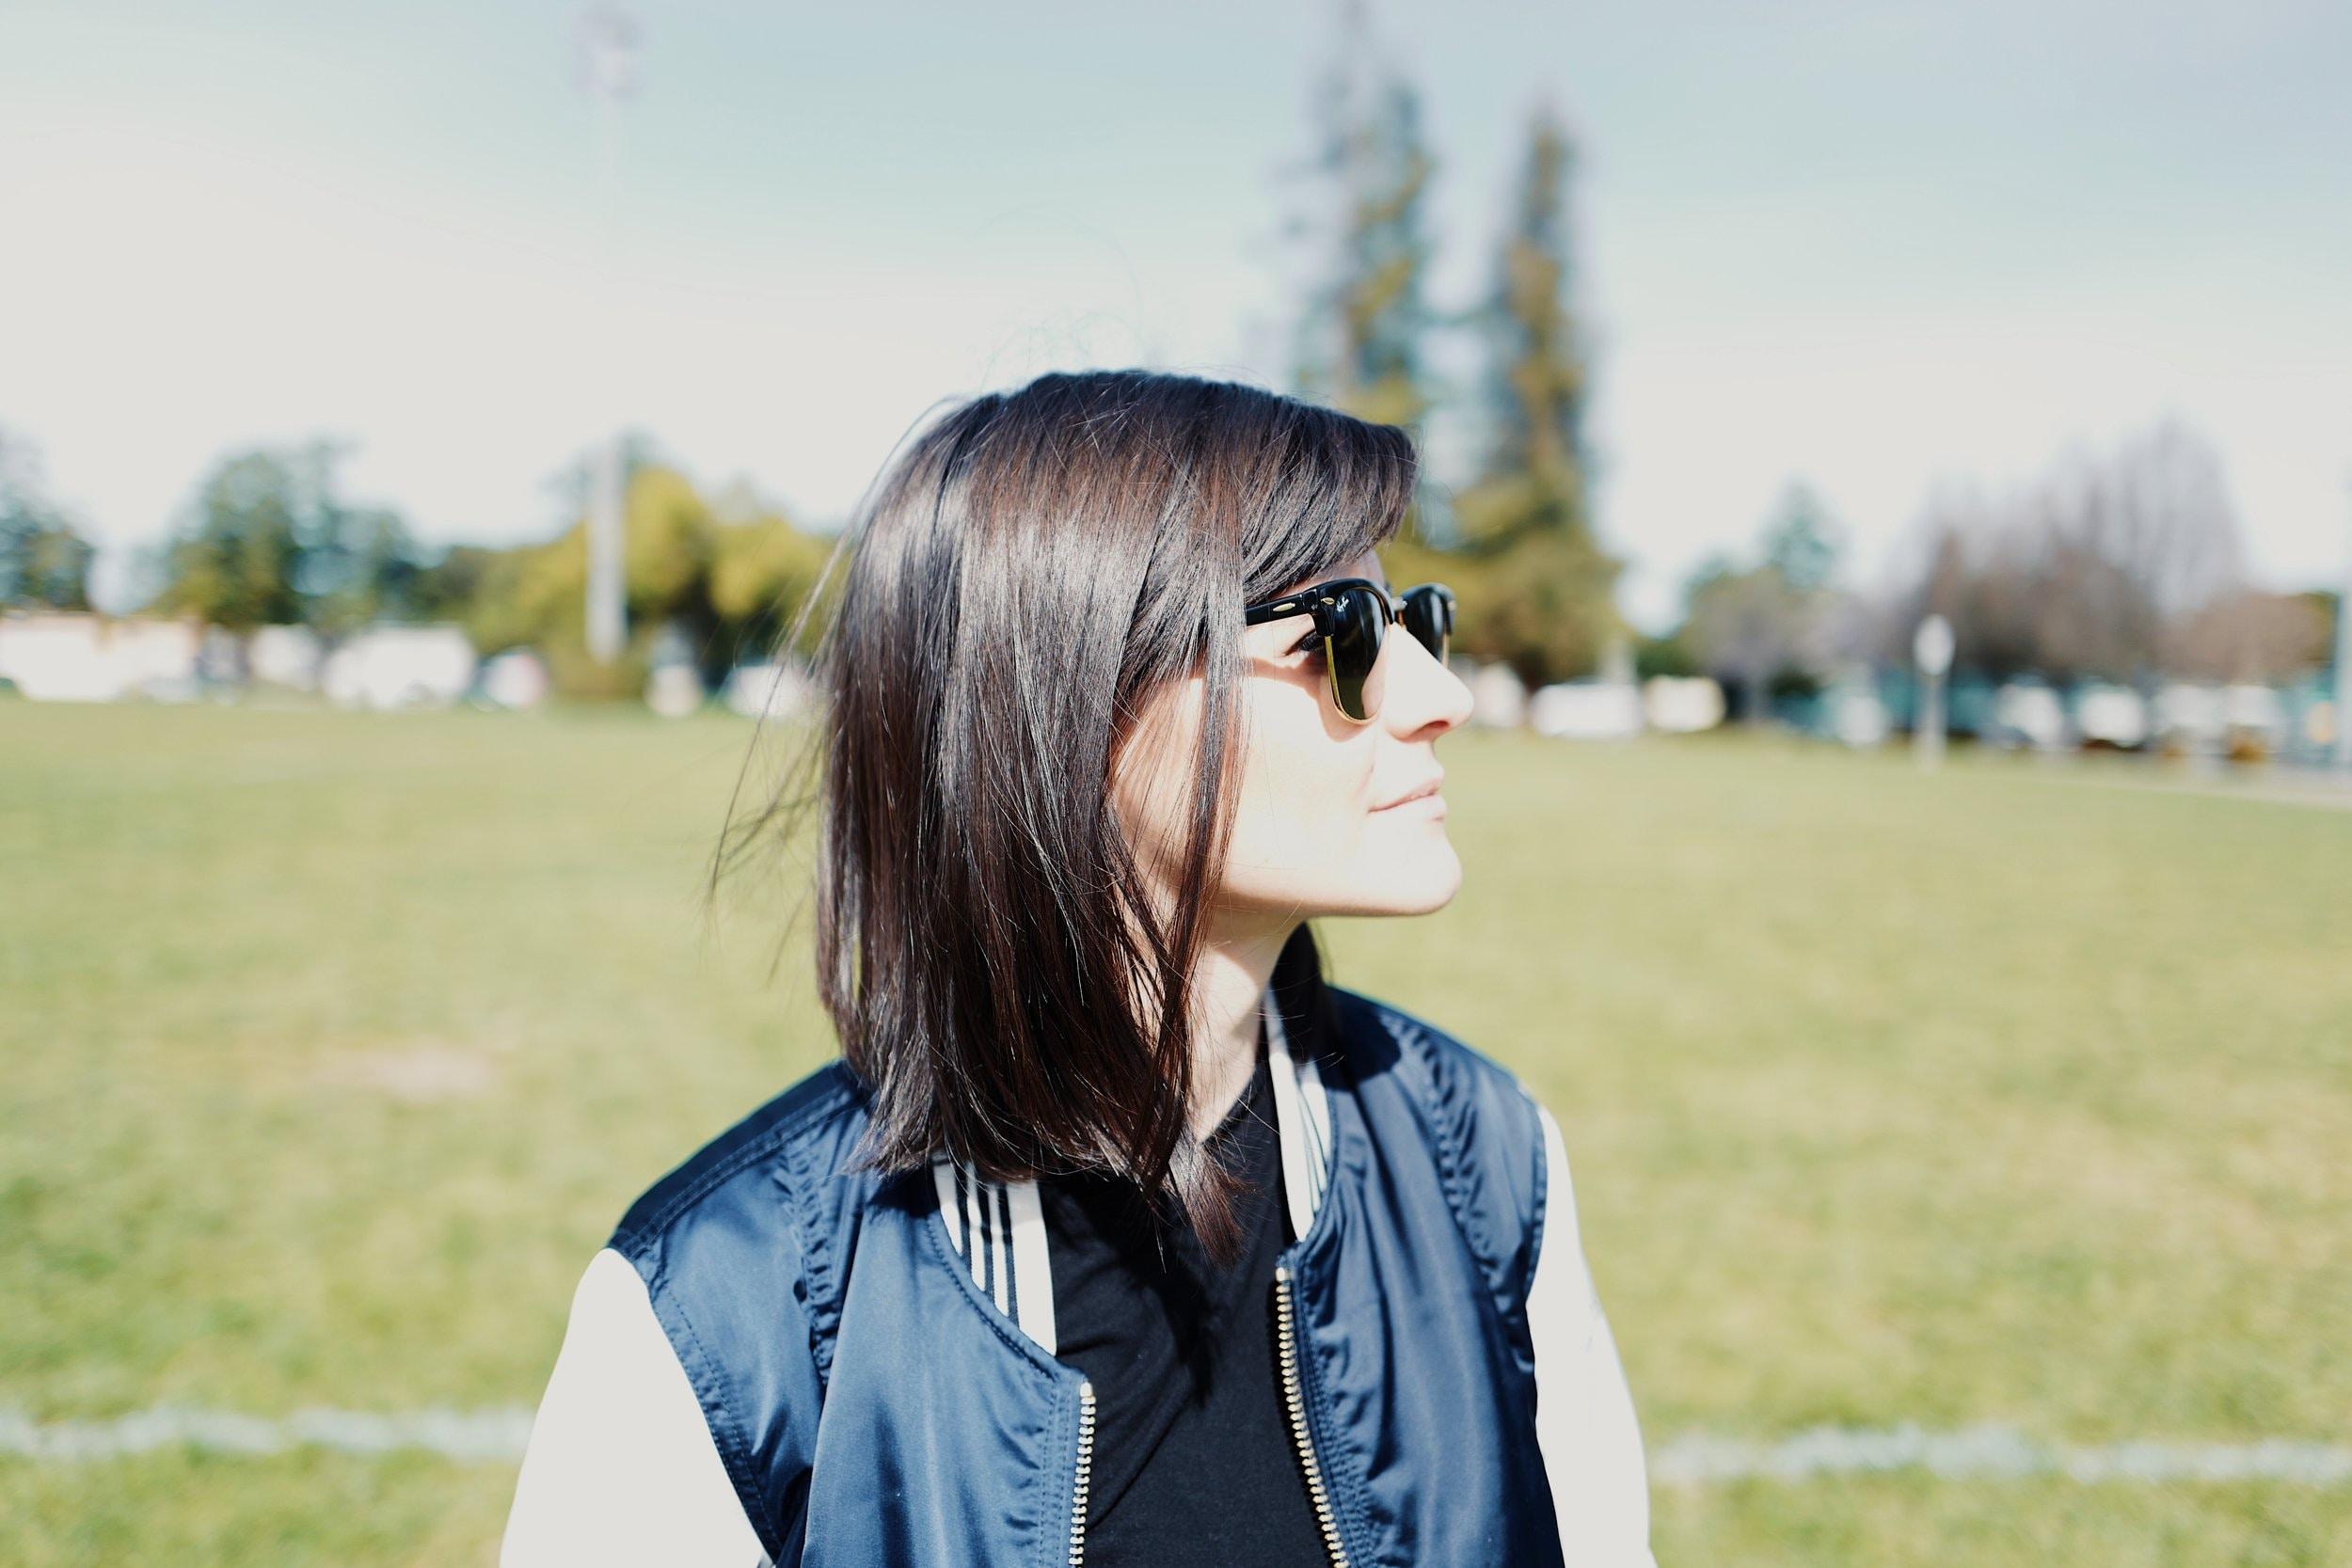 Go to Ana do Amaral's profile